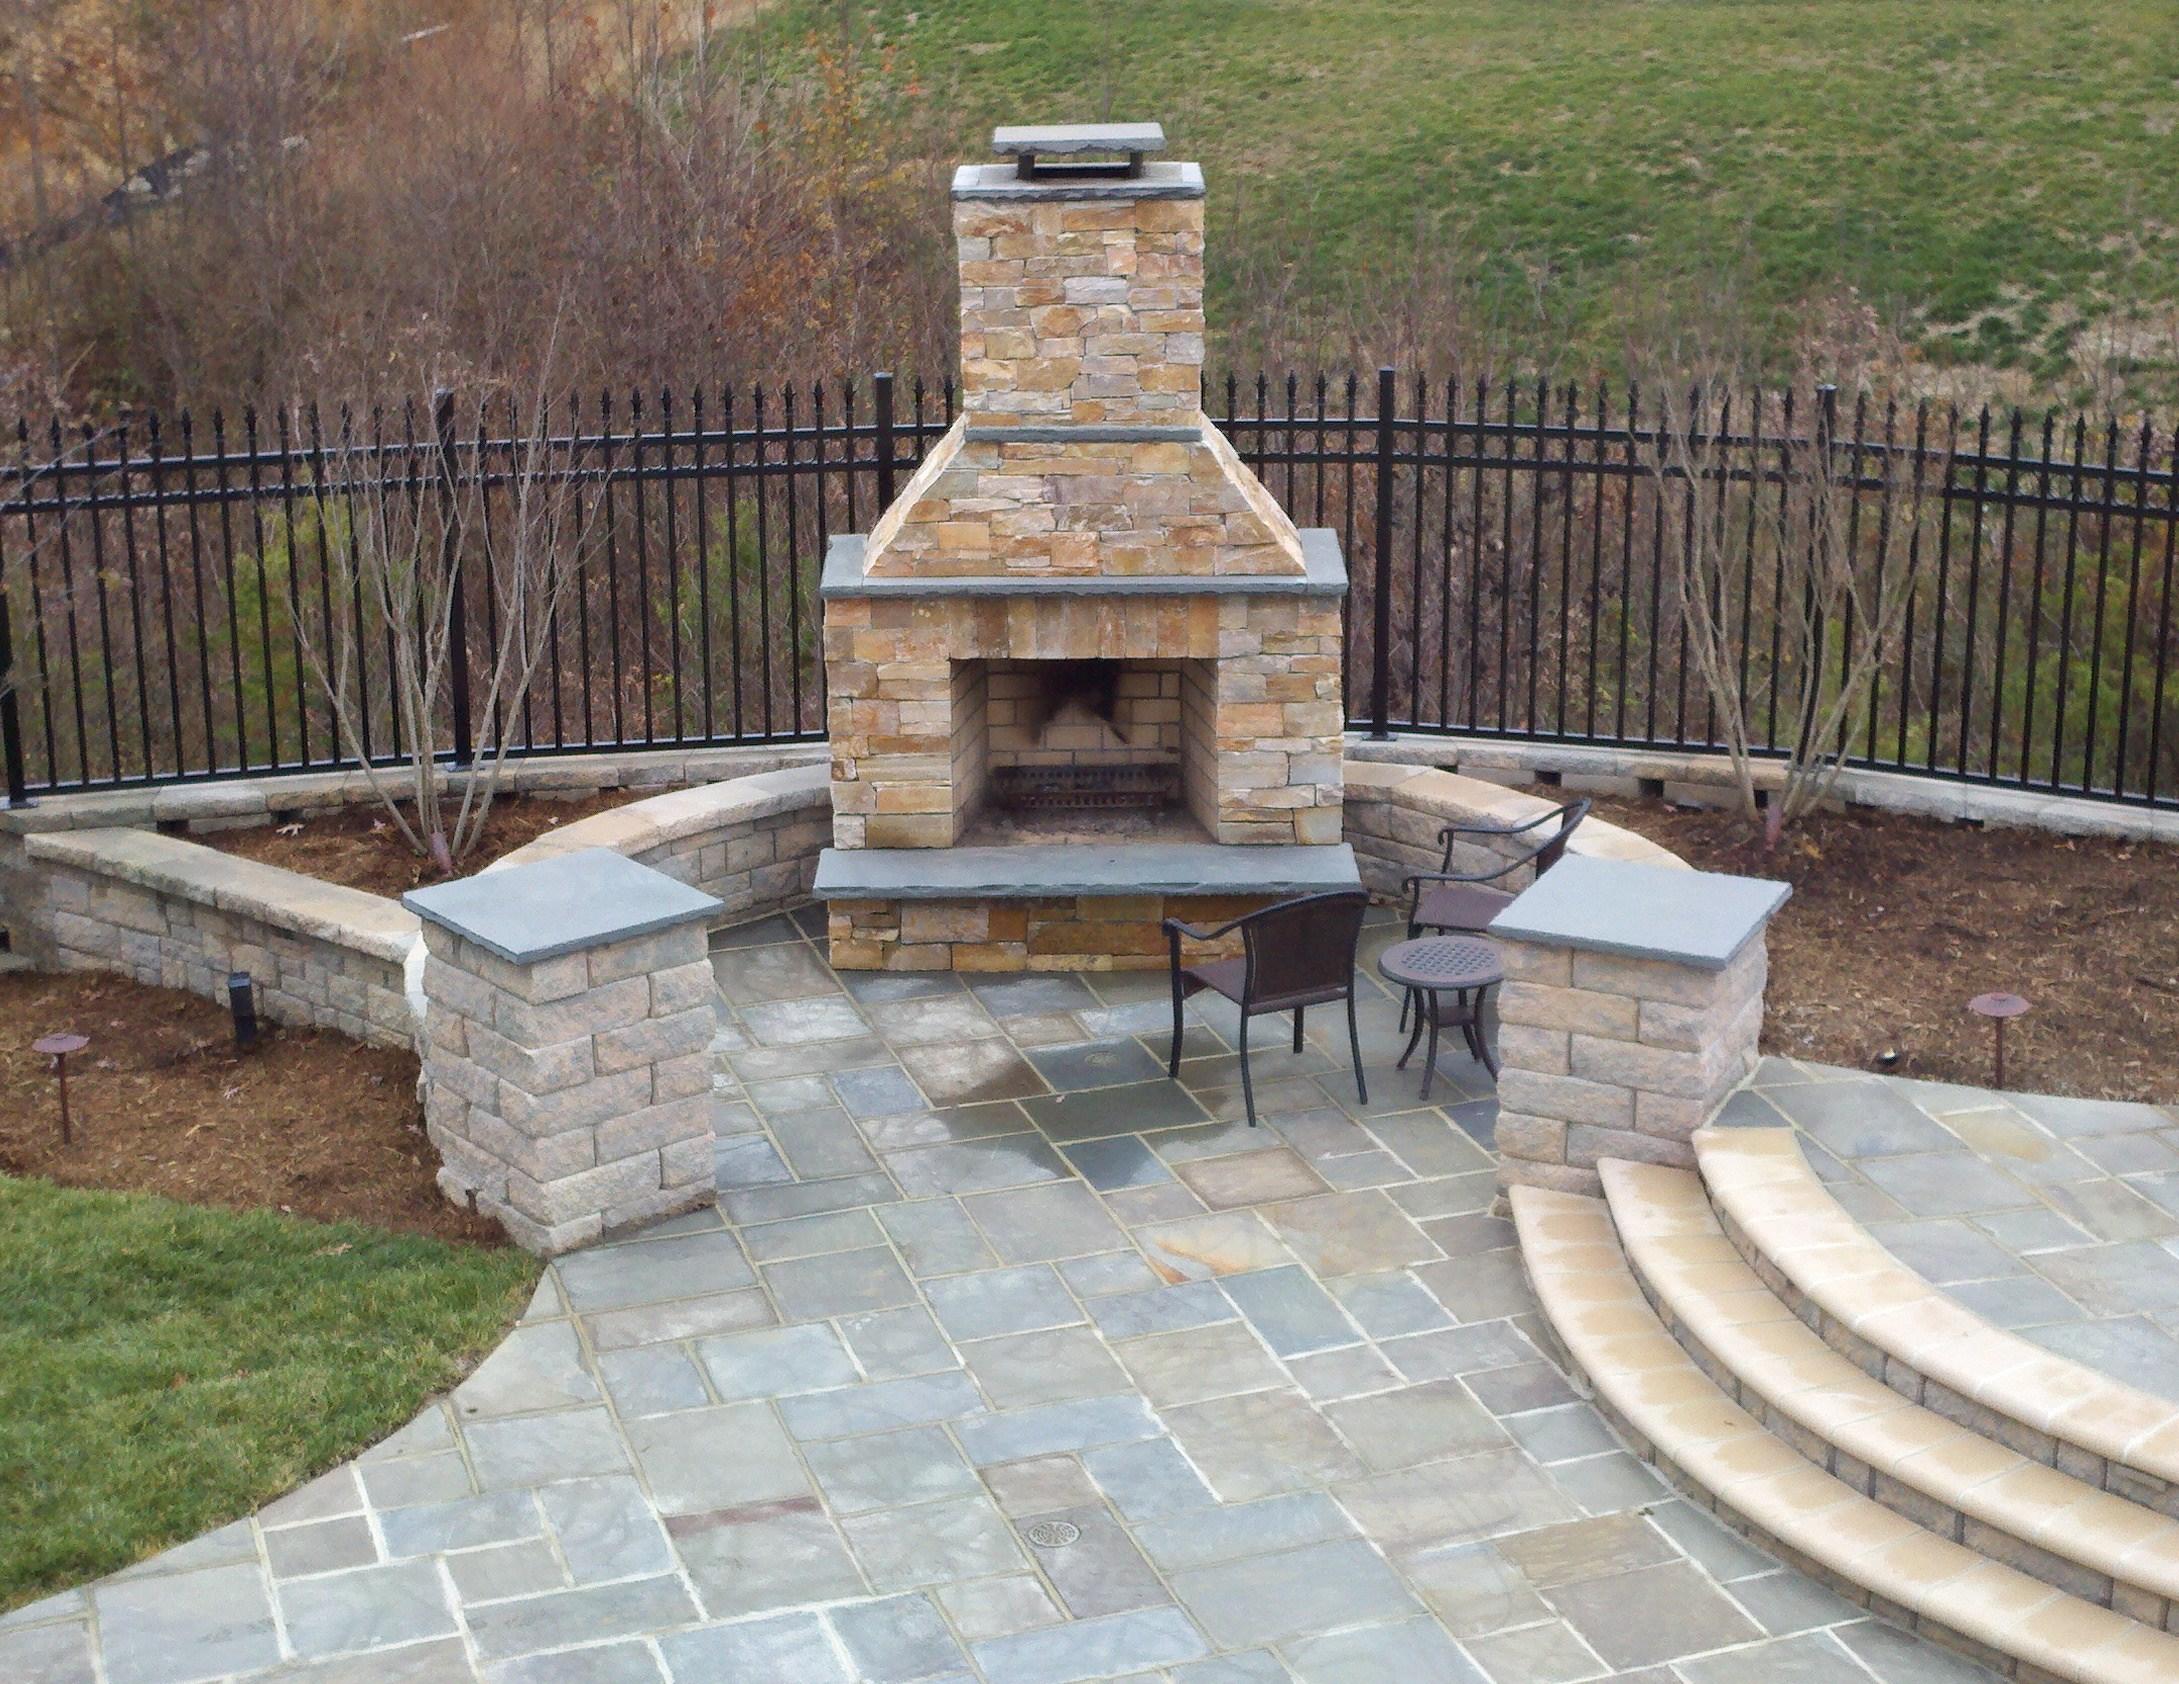 Stone Patio Design and Stone Patio Construction Noethern ... on Stone Backyard Patio id=70902